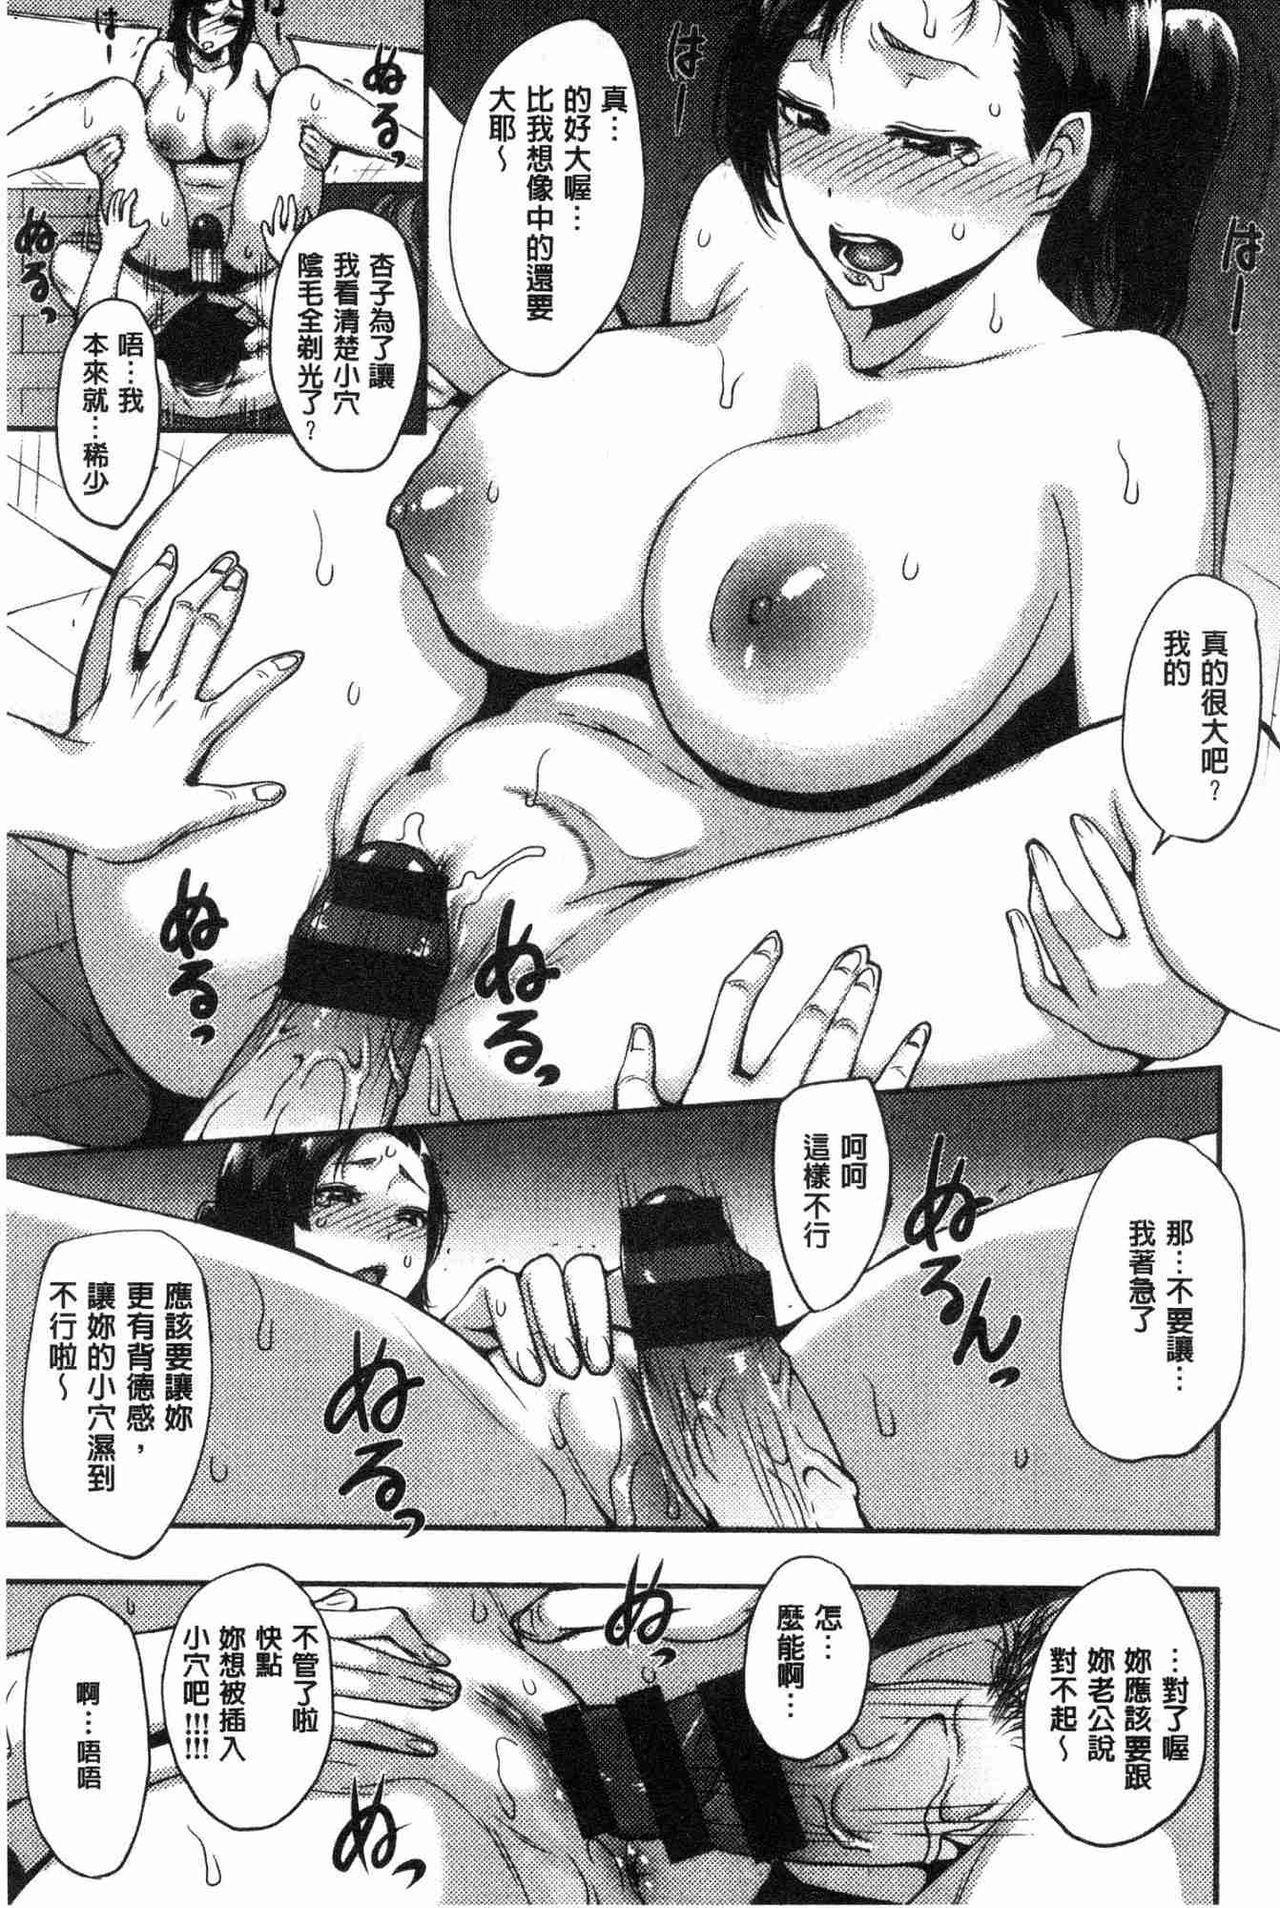 SEX LECTURE 114